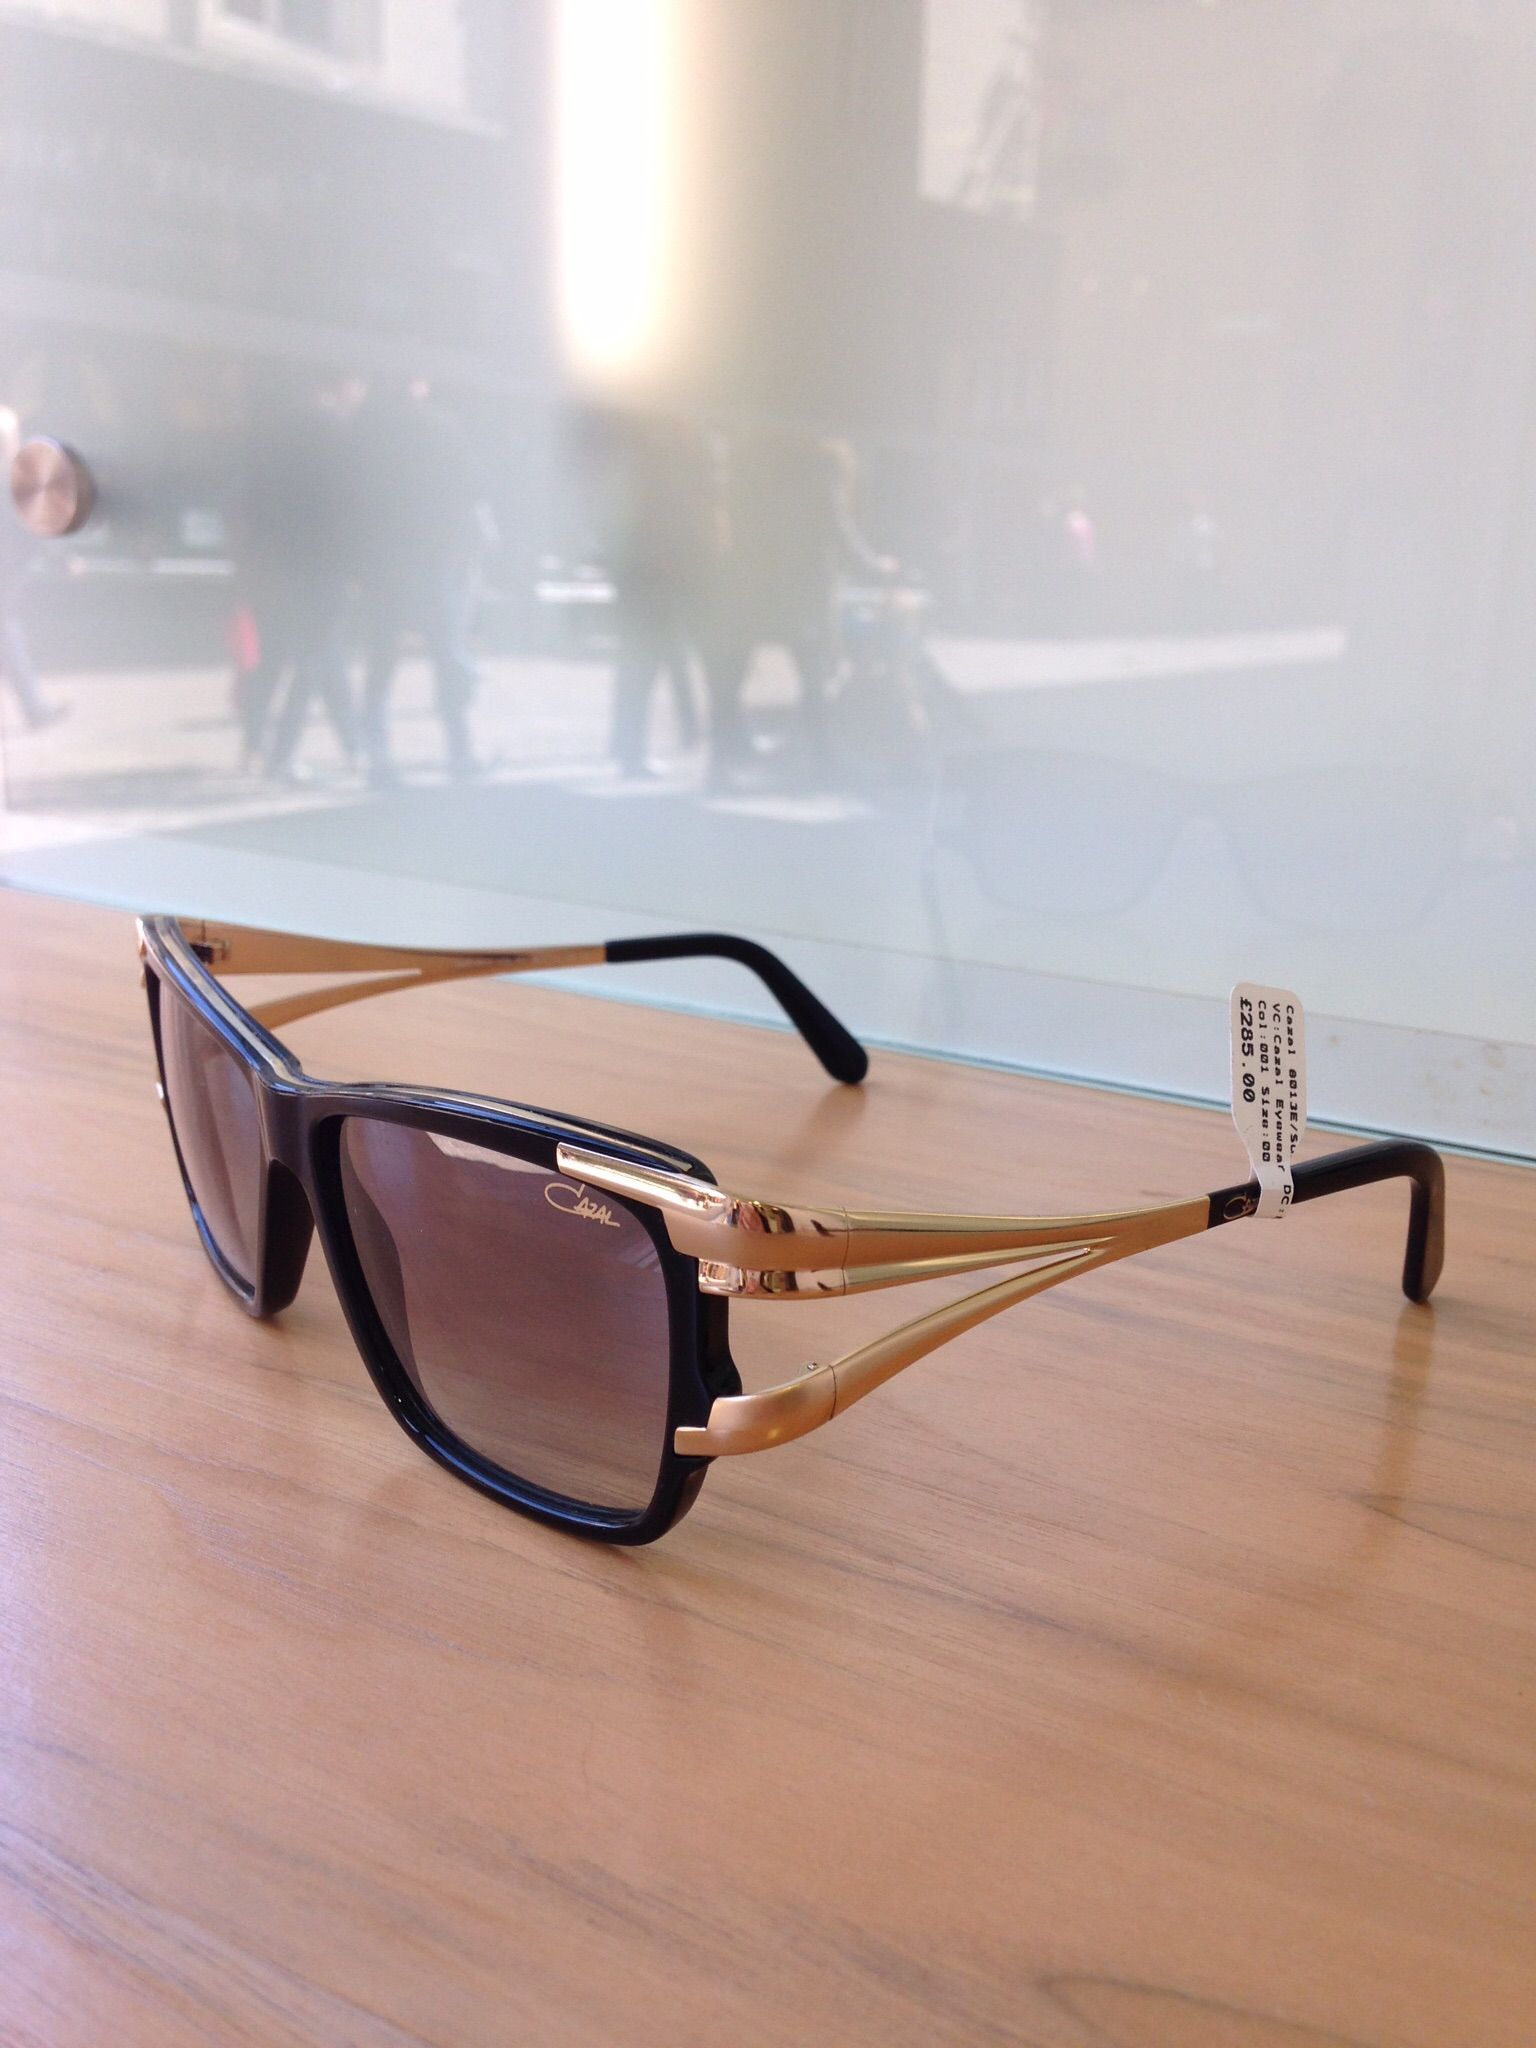 d3c1b5e74d1 Cazal Eyewear - Dipple   Conway